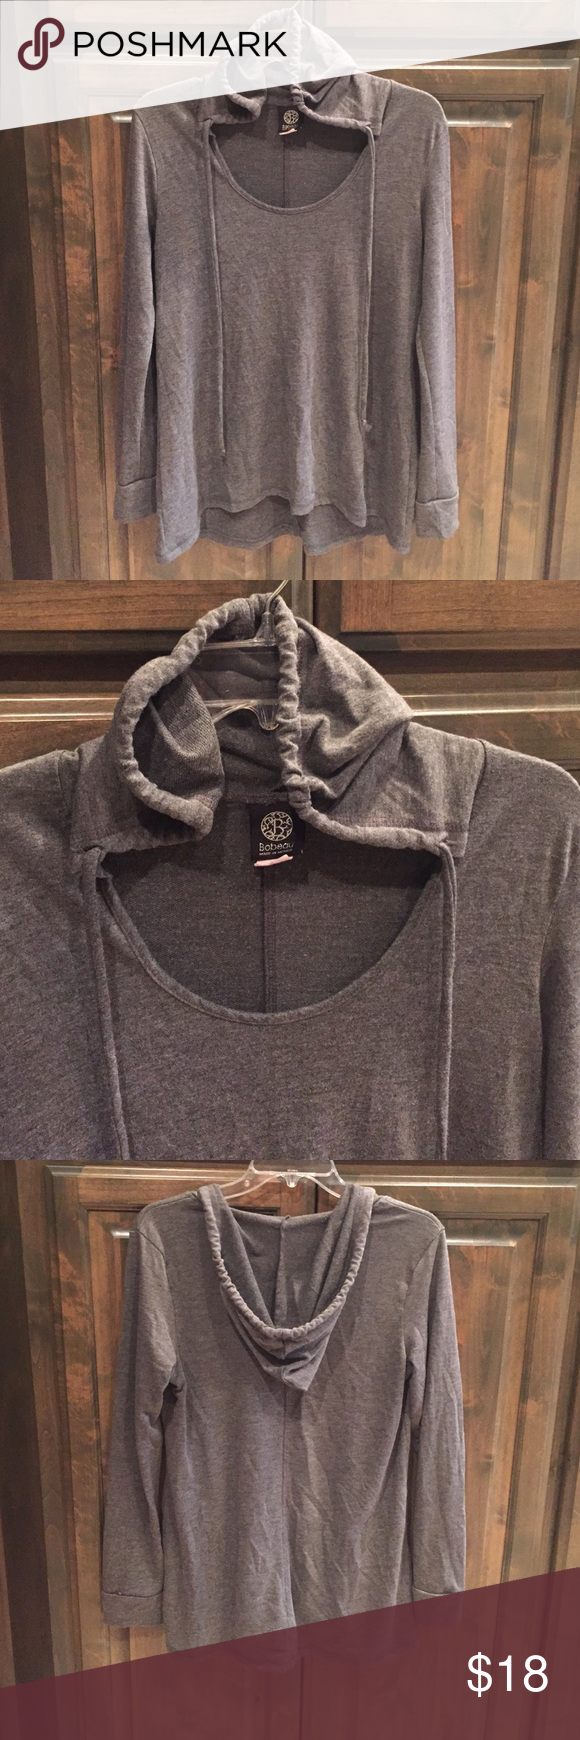 Bobeau Gray Hoodie LS Pullover Top M $58! Bobeau Gray Hoodie LS Pullover Top- size Medium - poly/ rayon/ spandex- some faint piling - bought brand new last season for $58!! bobeau Tops Sweatshirts & Hoodies